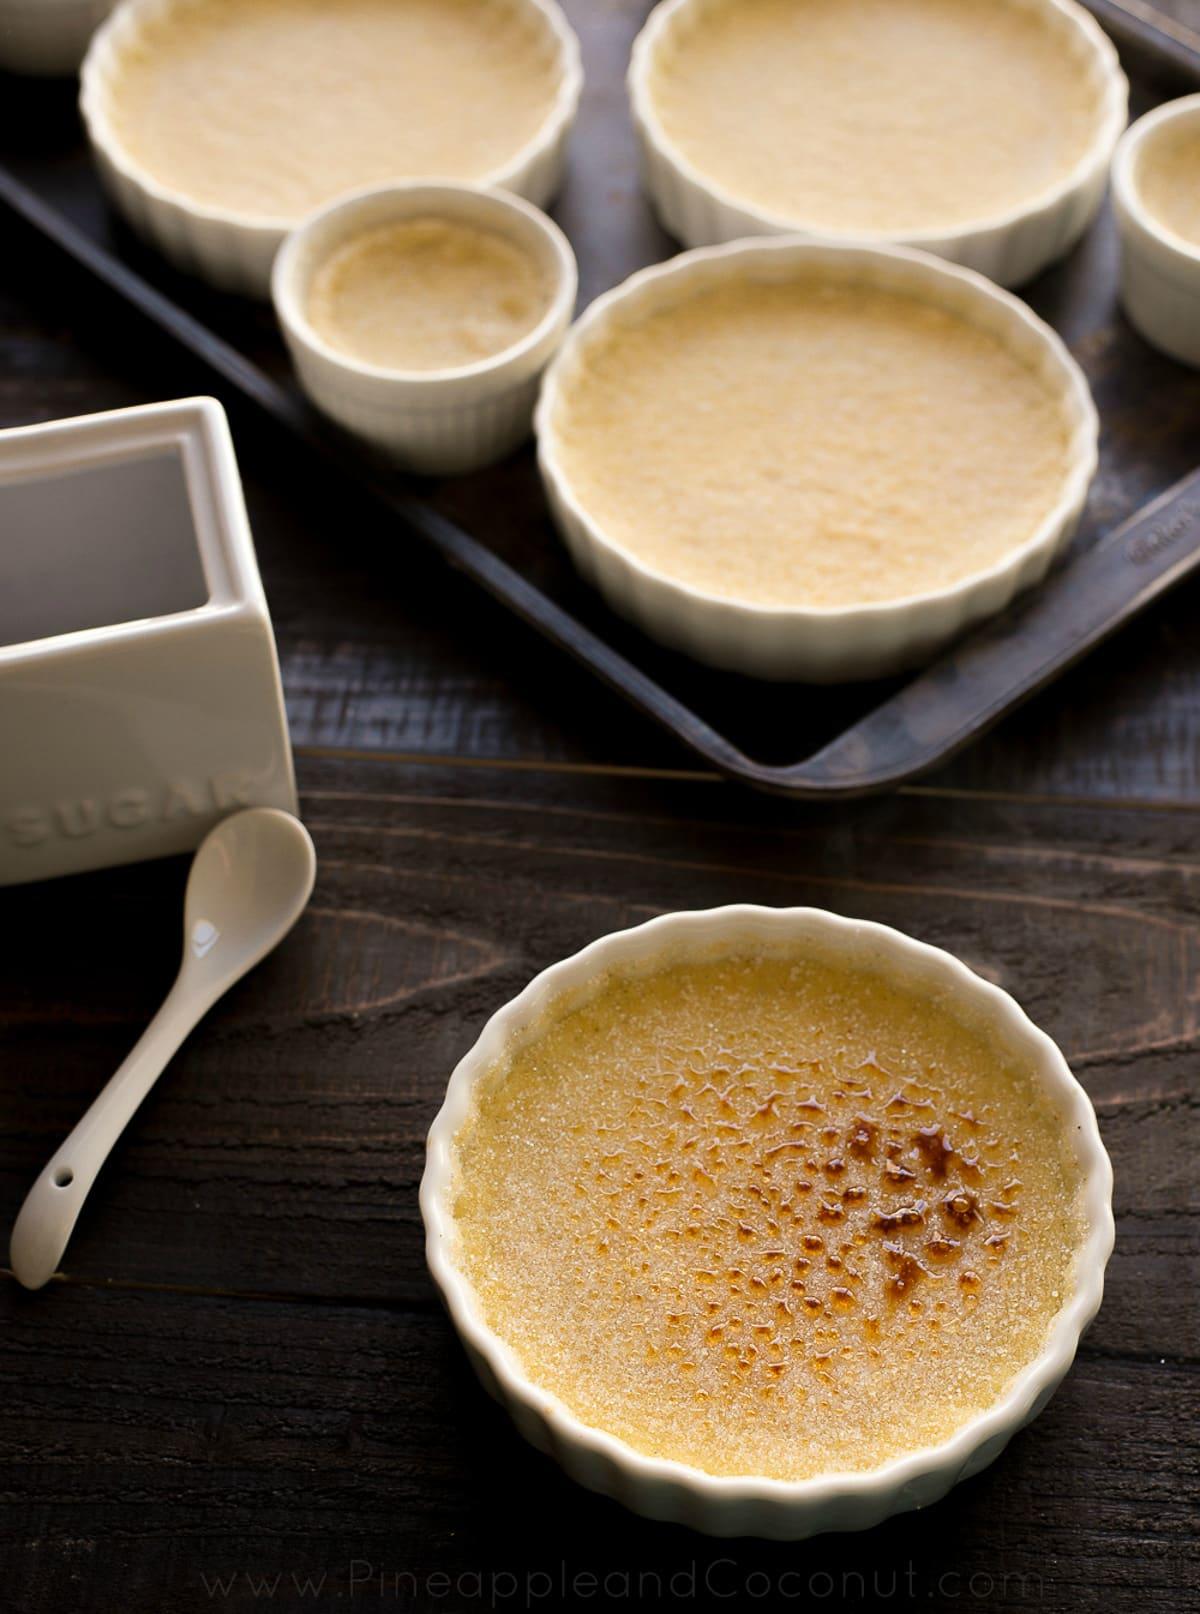 yellow custard in white ramekins spoons white sugar bowl